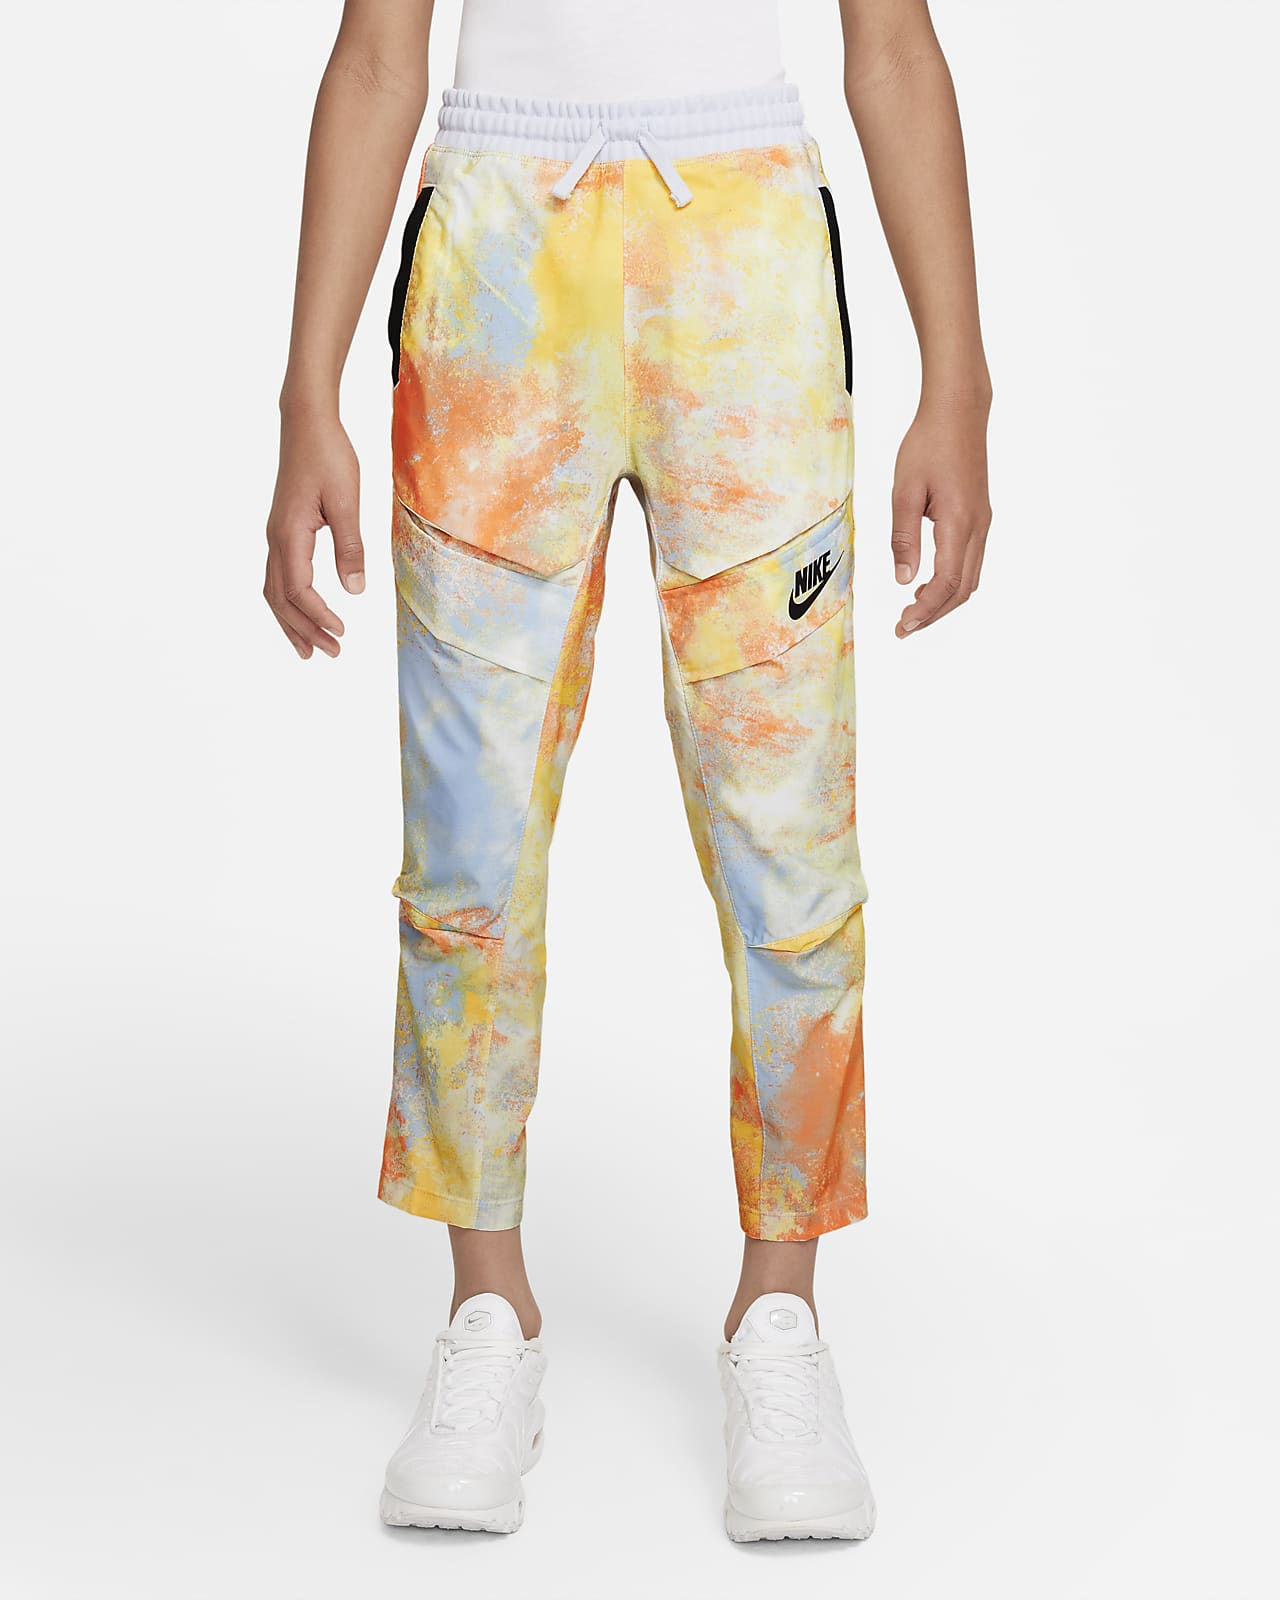 Nike Sportswear Big Kids' (Boys') Woven Tie-Dye 3/4-Length Pants